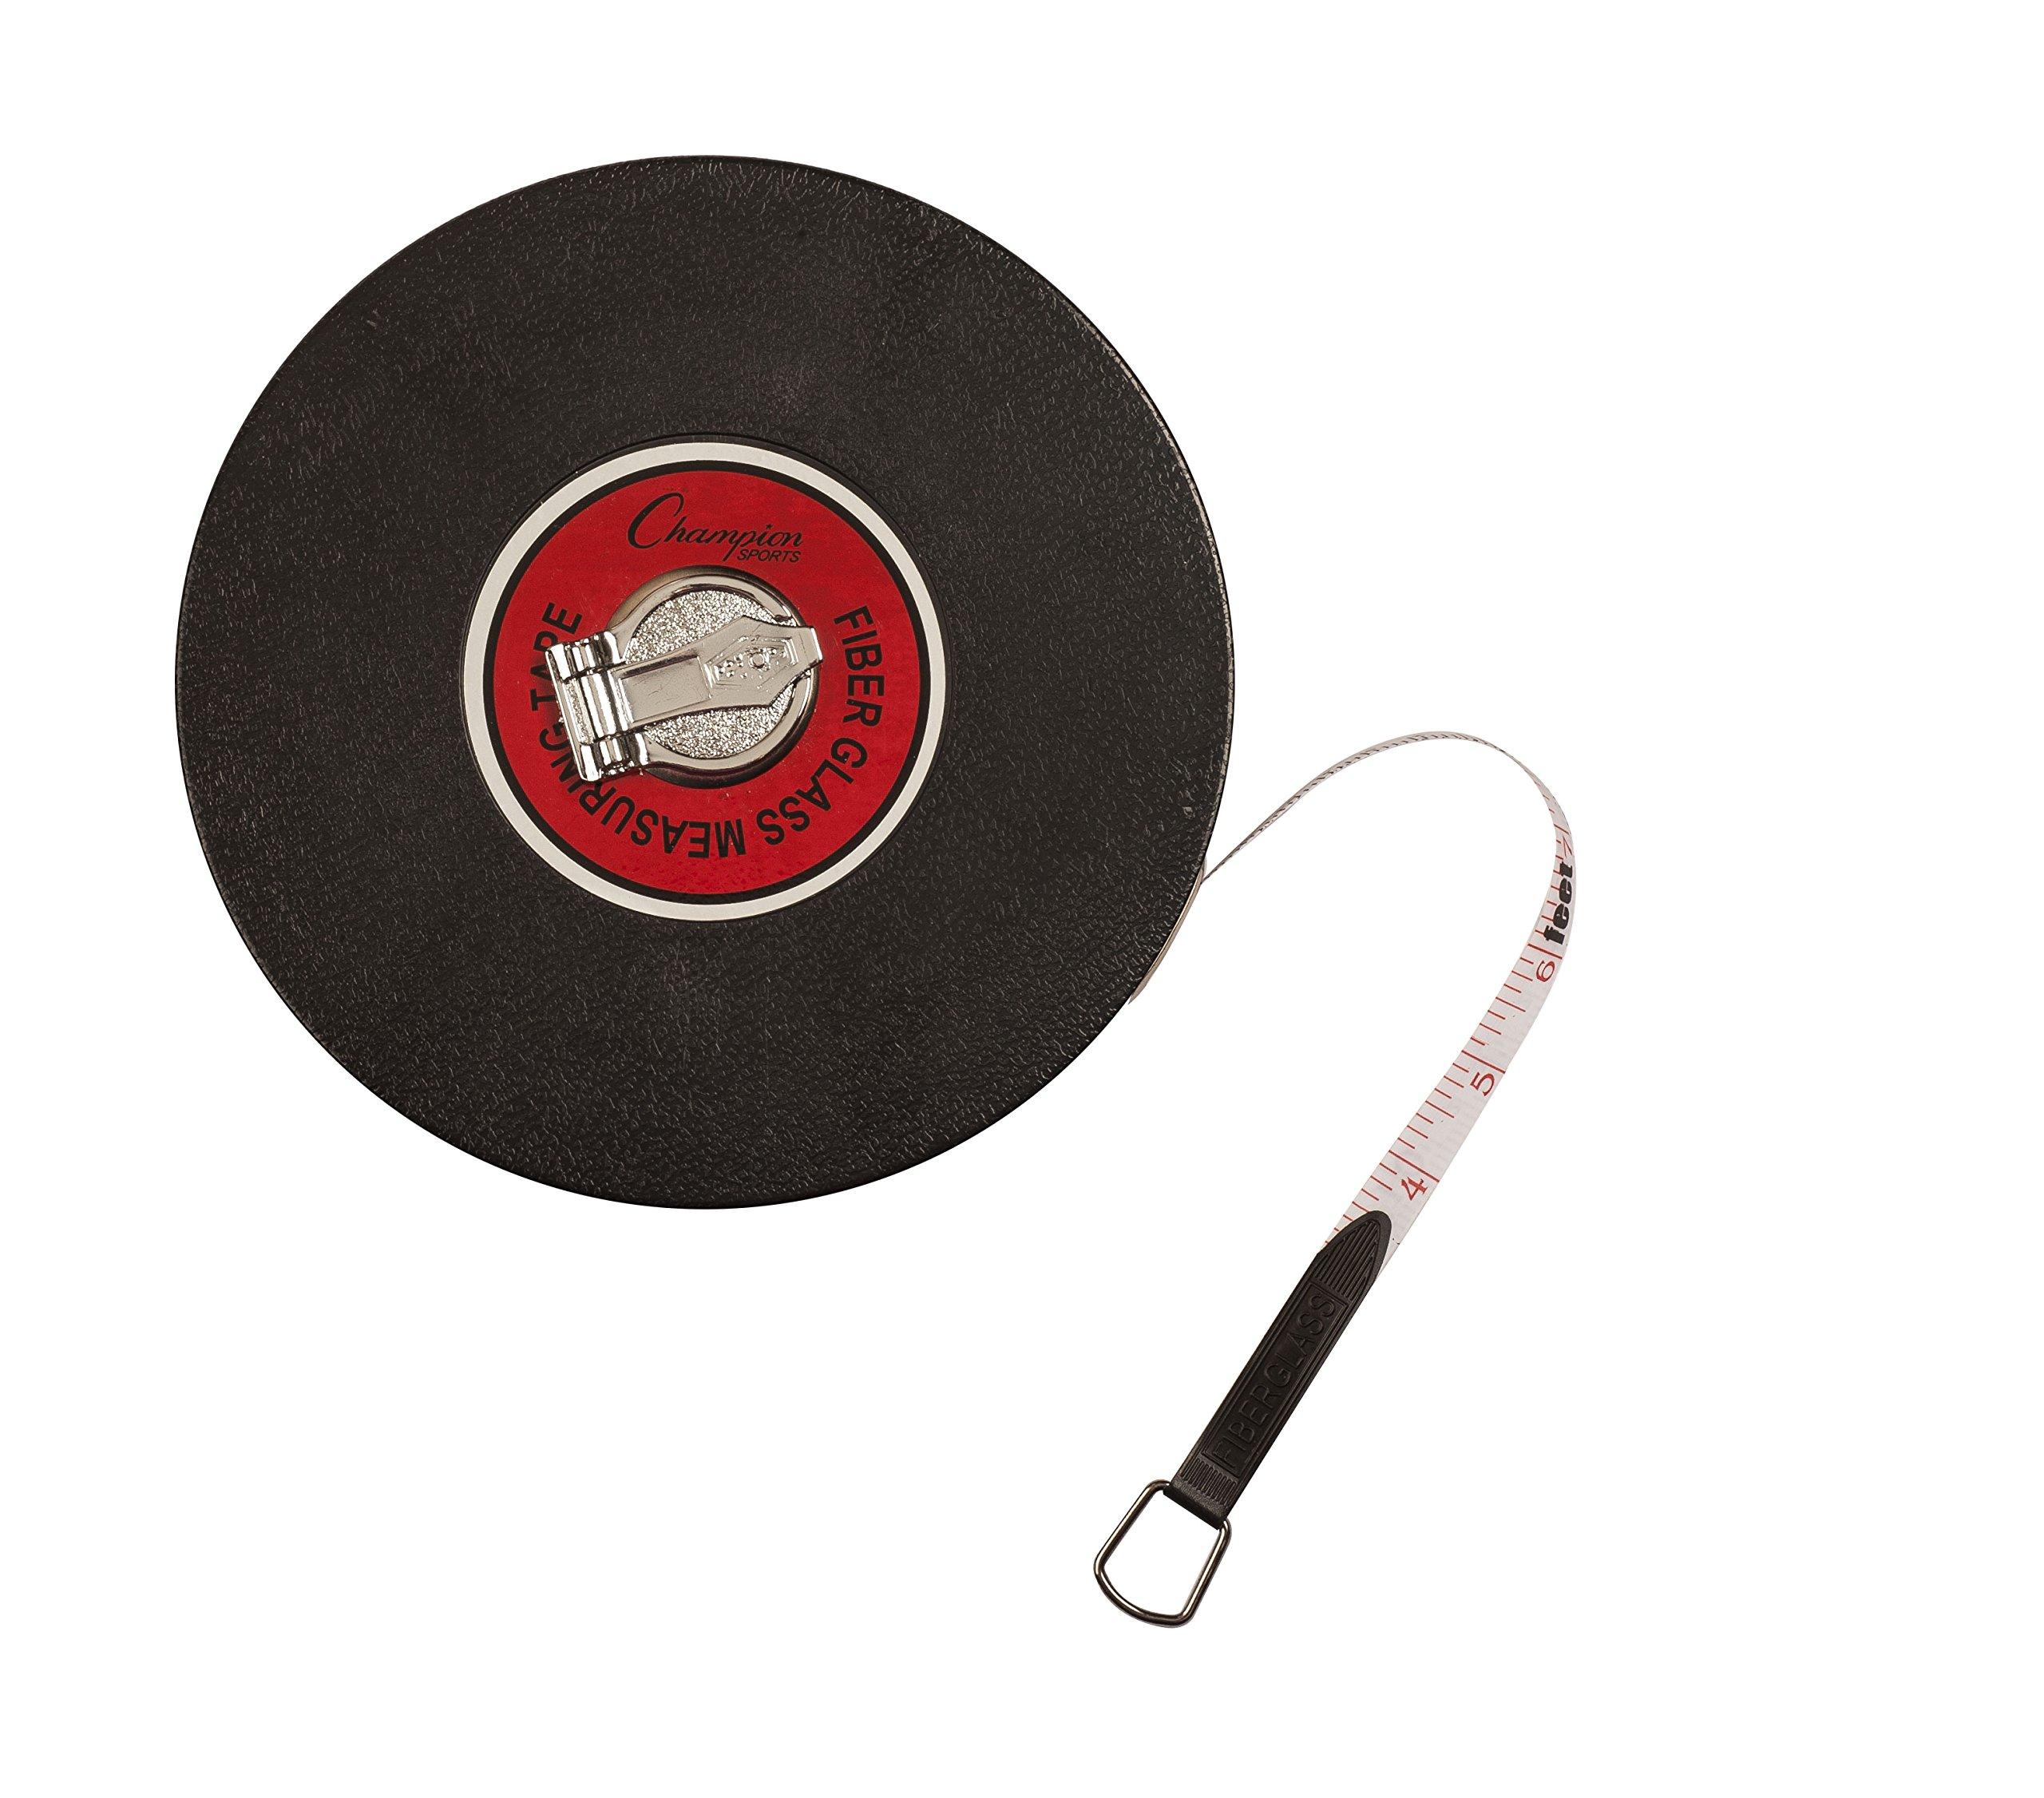 Length 0.5 Starrett KTS537-300ME-N ABS Plastic Yellow Case Open Reel Fiberglass Long Tape 100m 12.7mm Width English//Metric Graduation Style 0.125 Graduation Interval 300